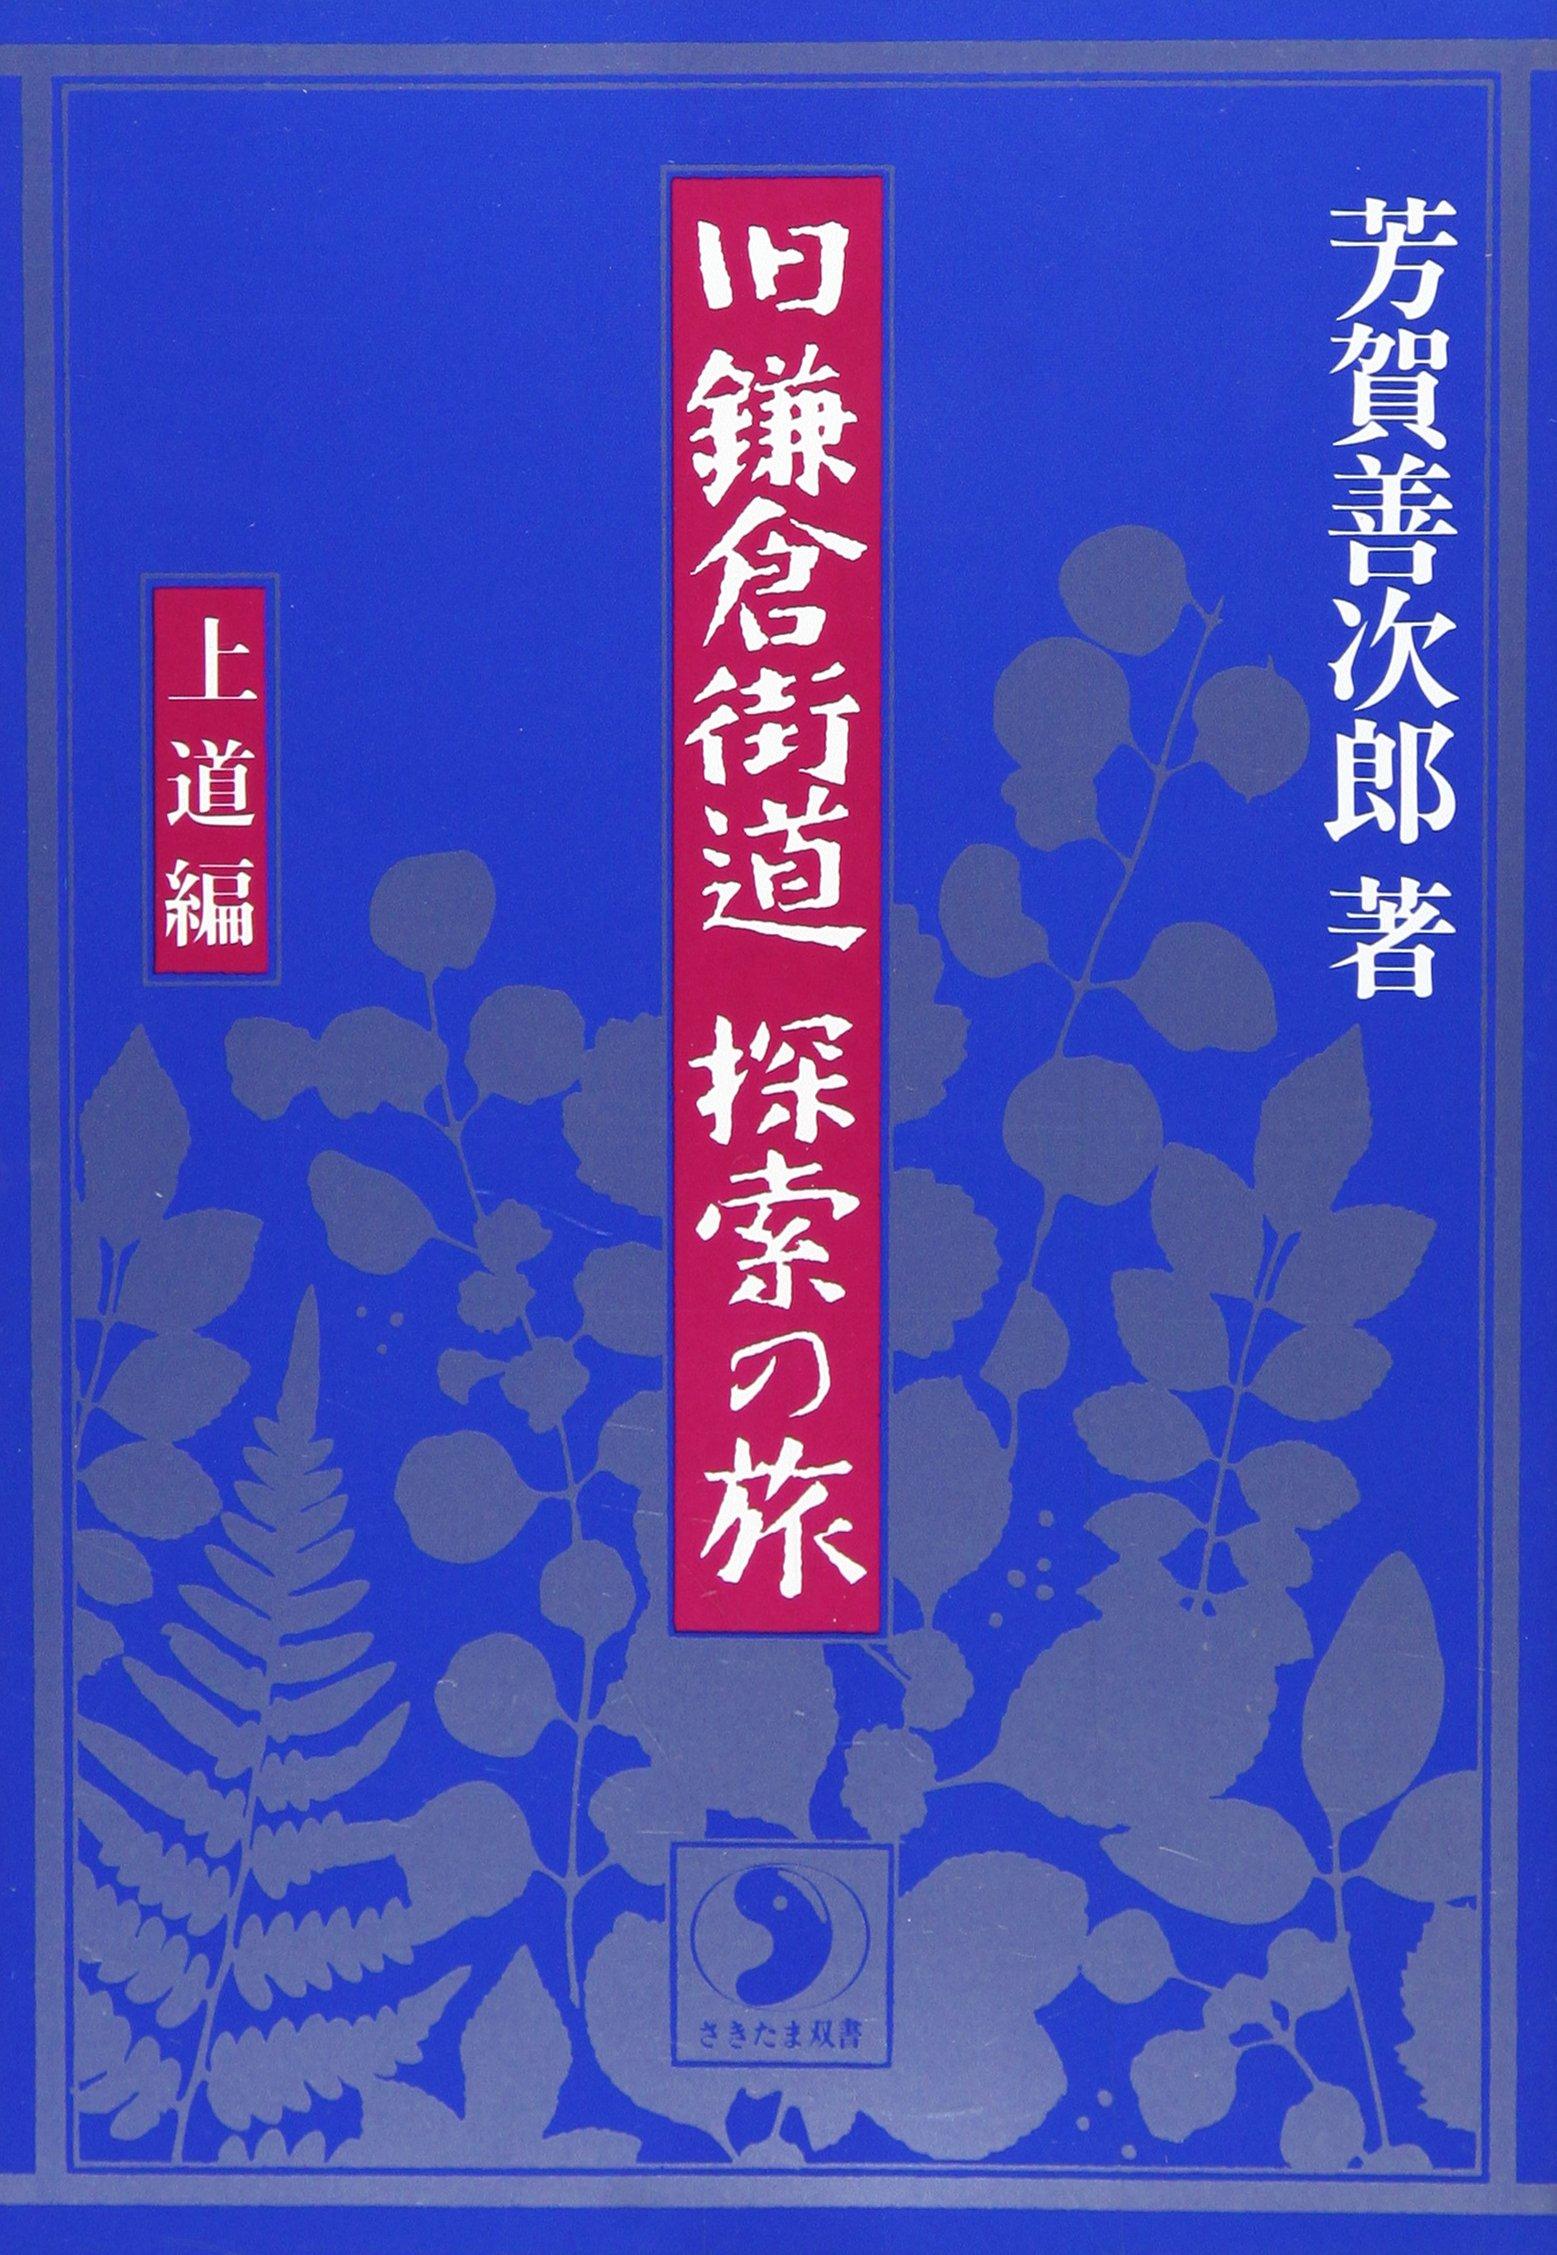 旧鎌倉街道・探索の旅 上道編